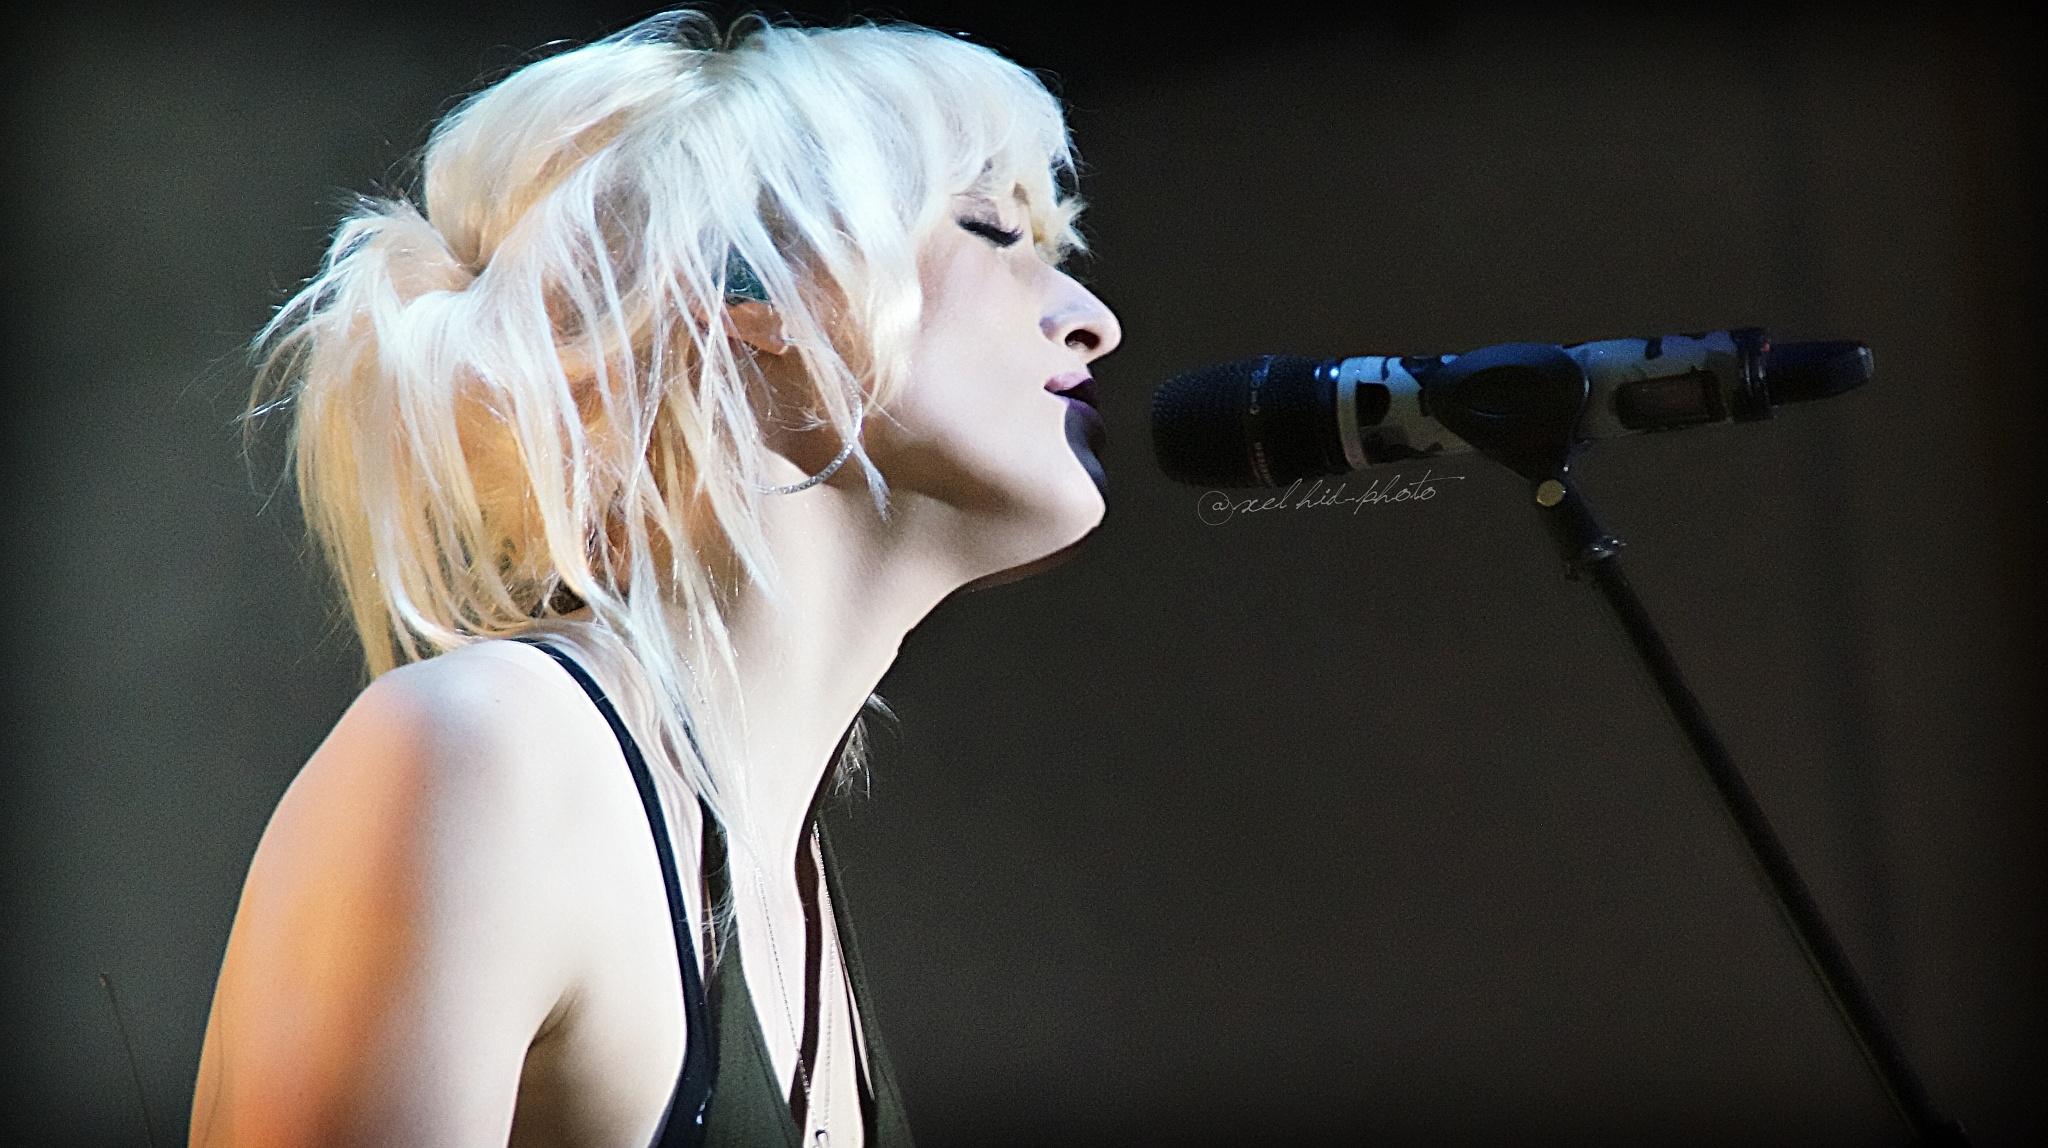 Jenny Ball  by @axel hid-photo